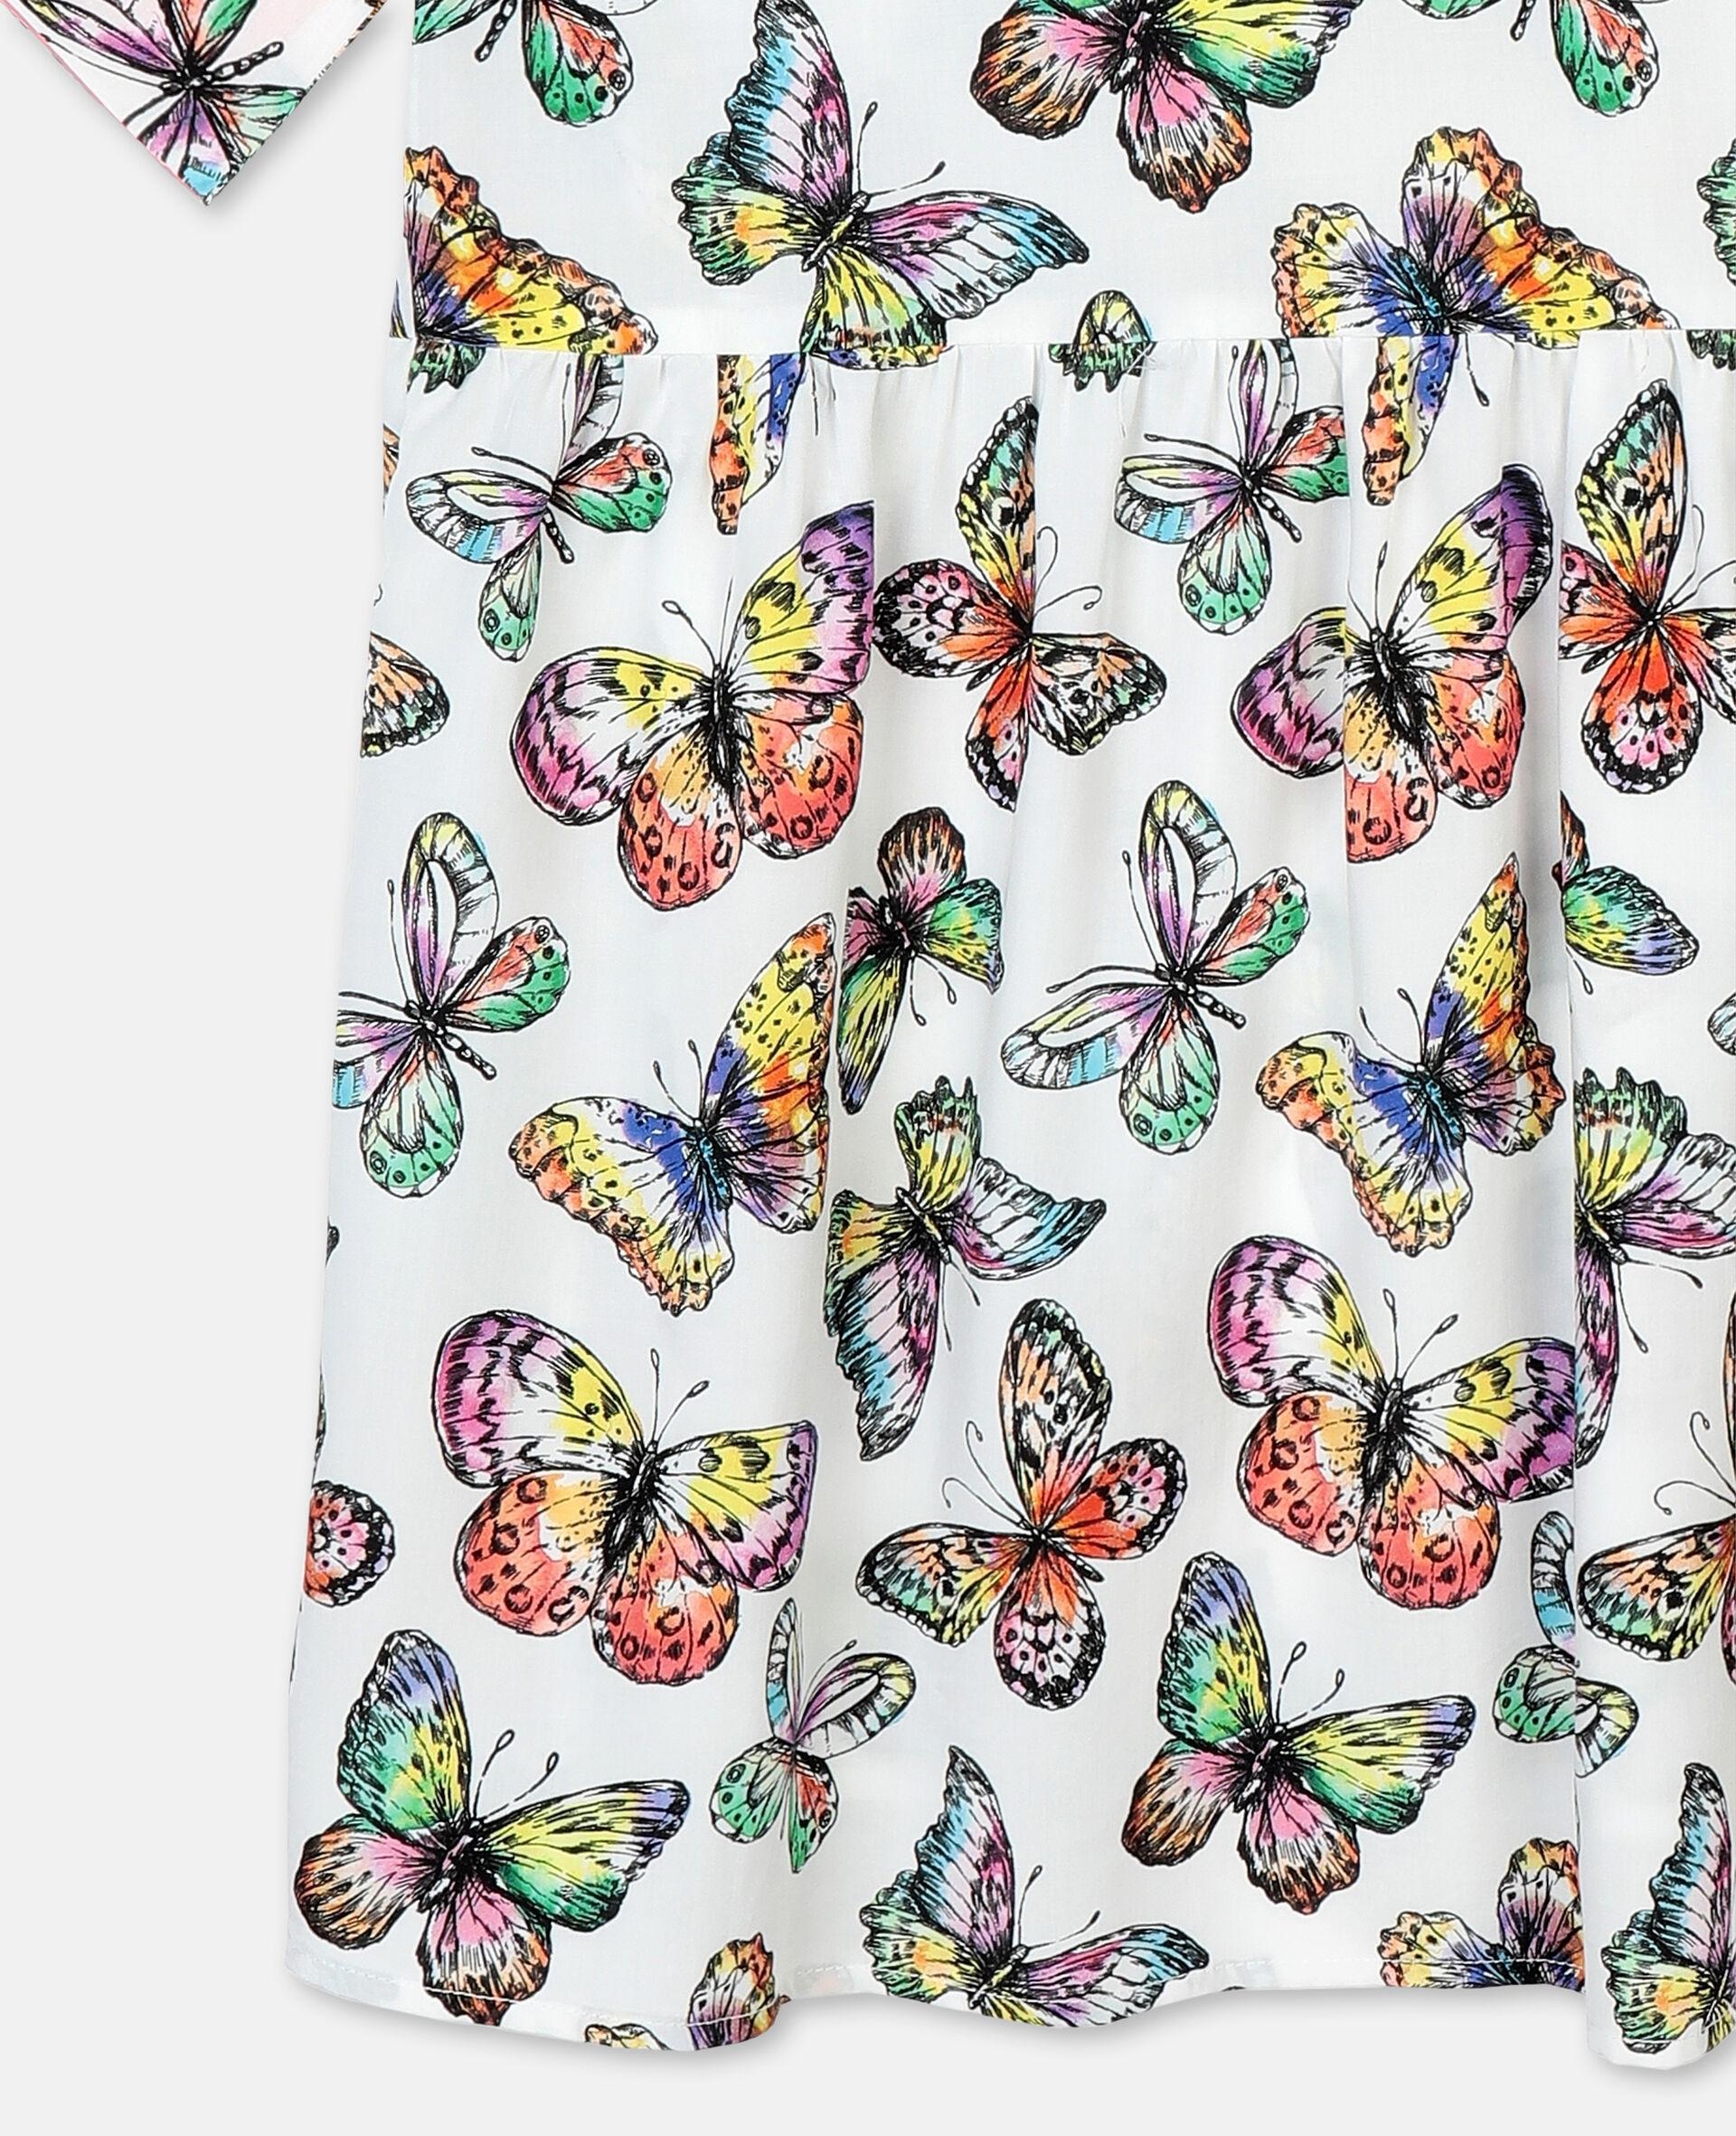 Oversized-Kleid aus Viskose mit Schmetterlingen-Bunt-large image number 2